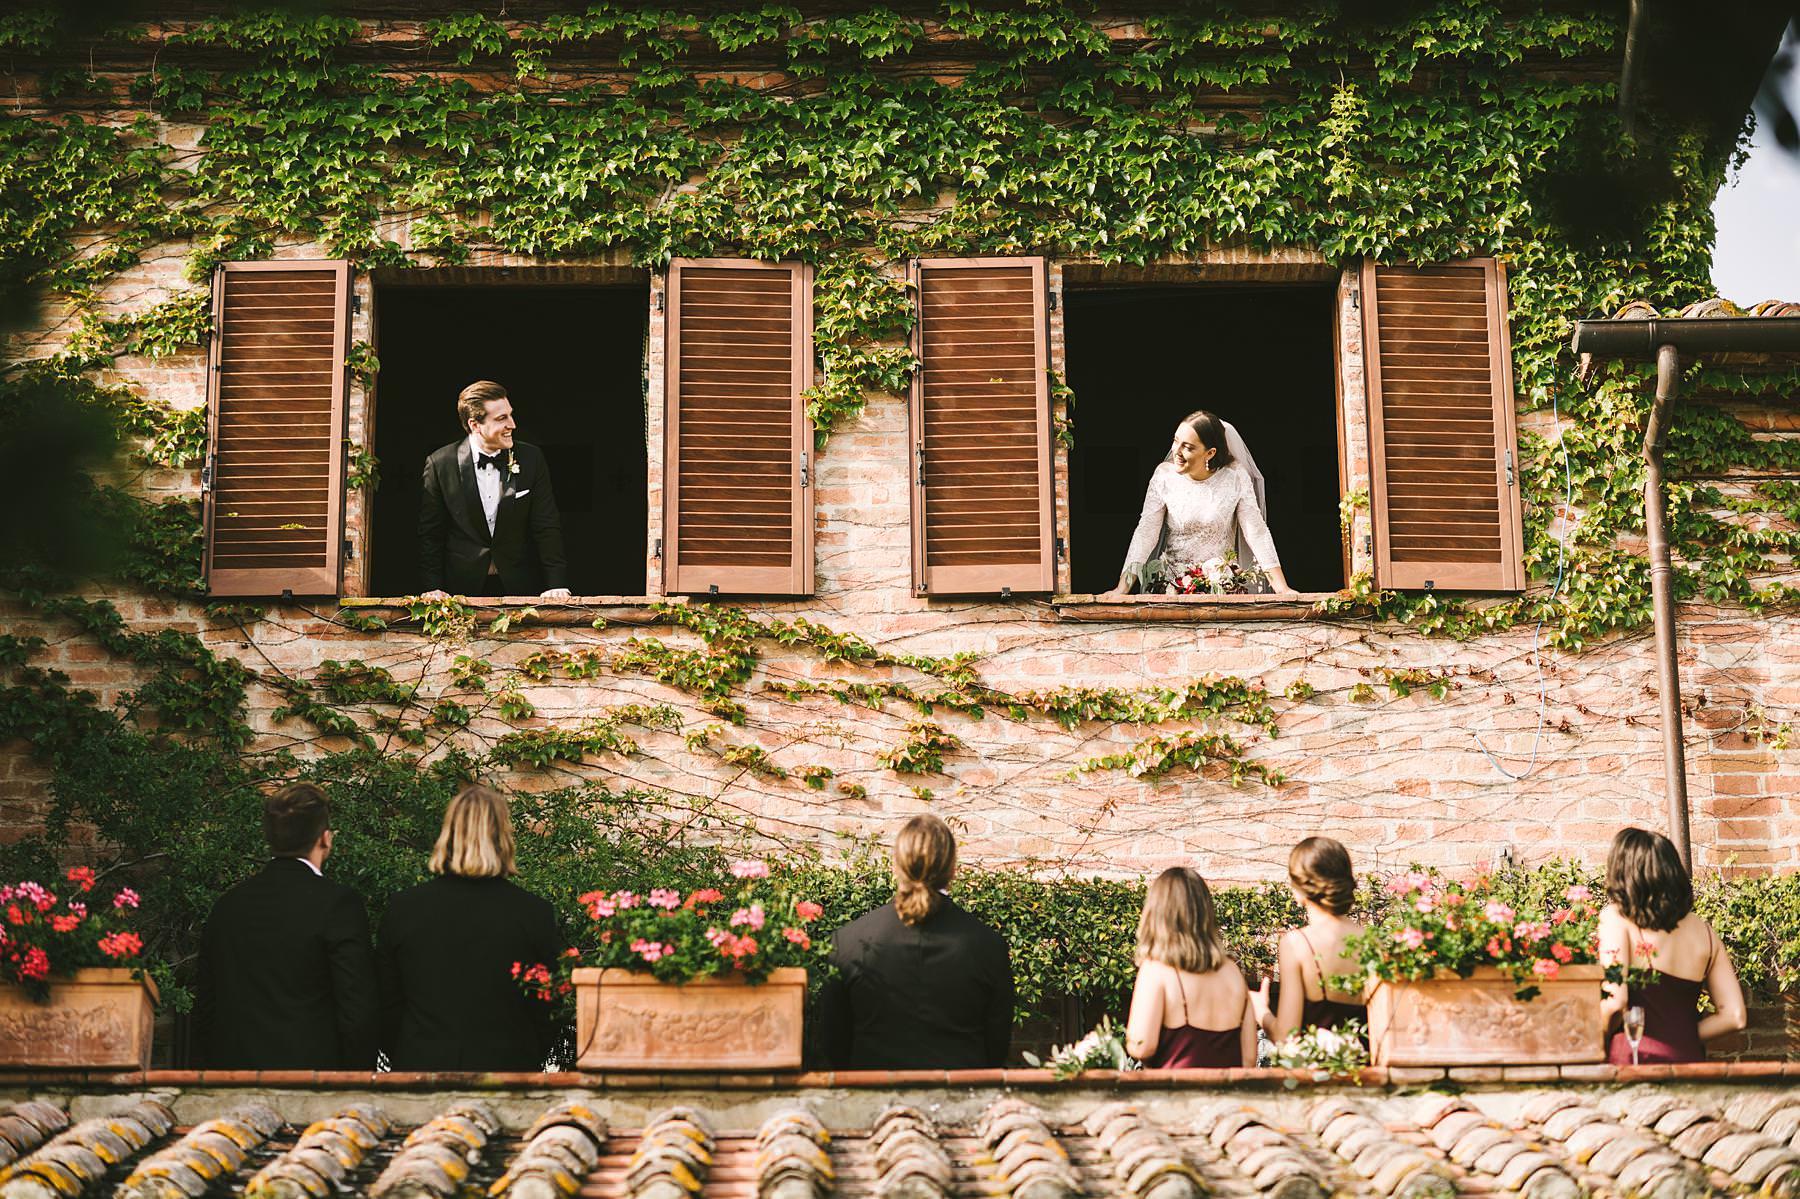 Bride and groom wedding photos with bridal party. Intimate destination wedding in Umbria